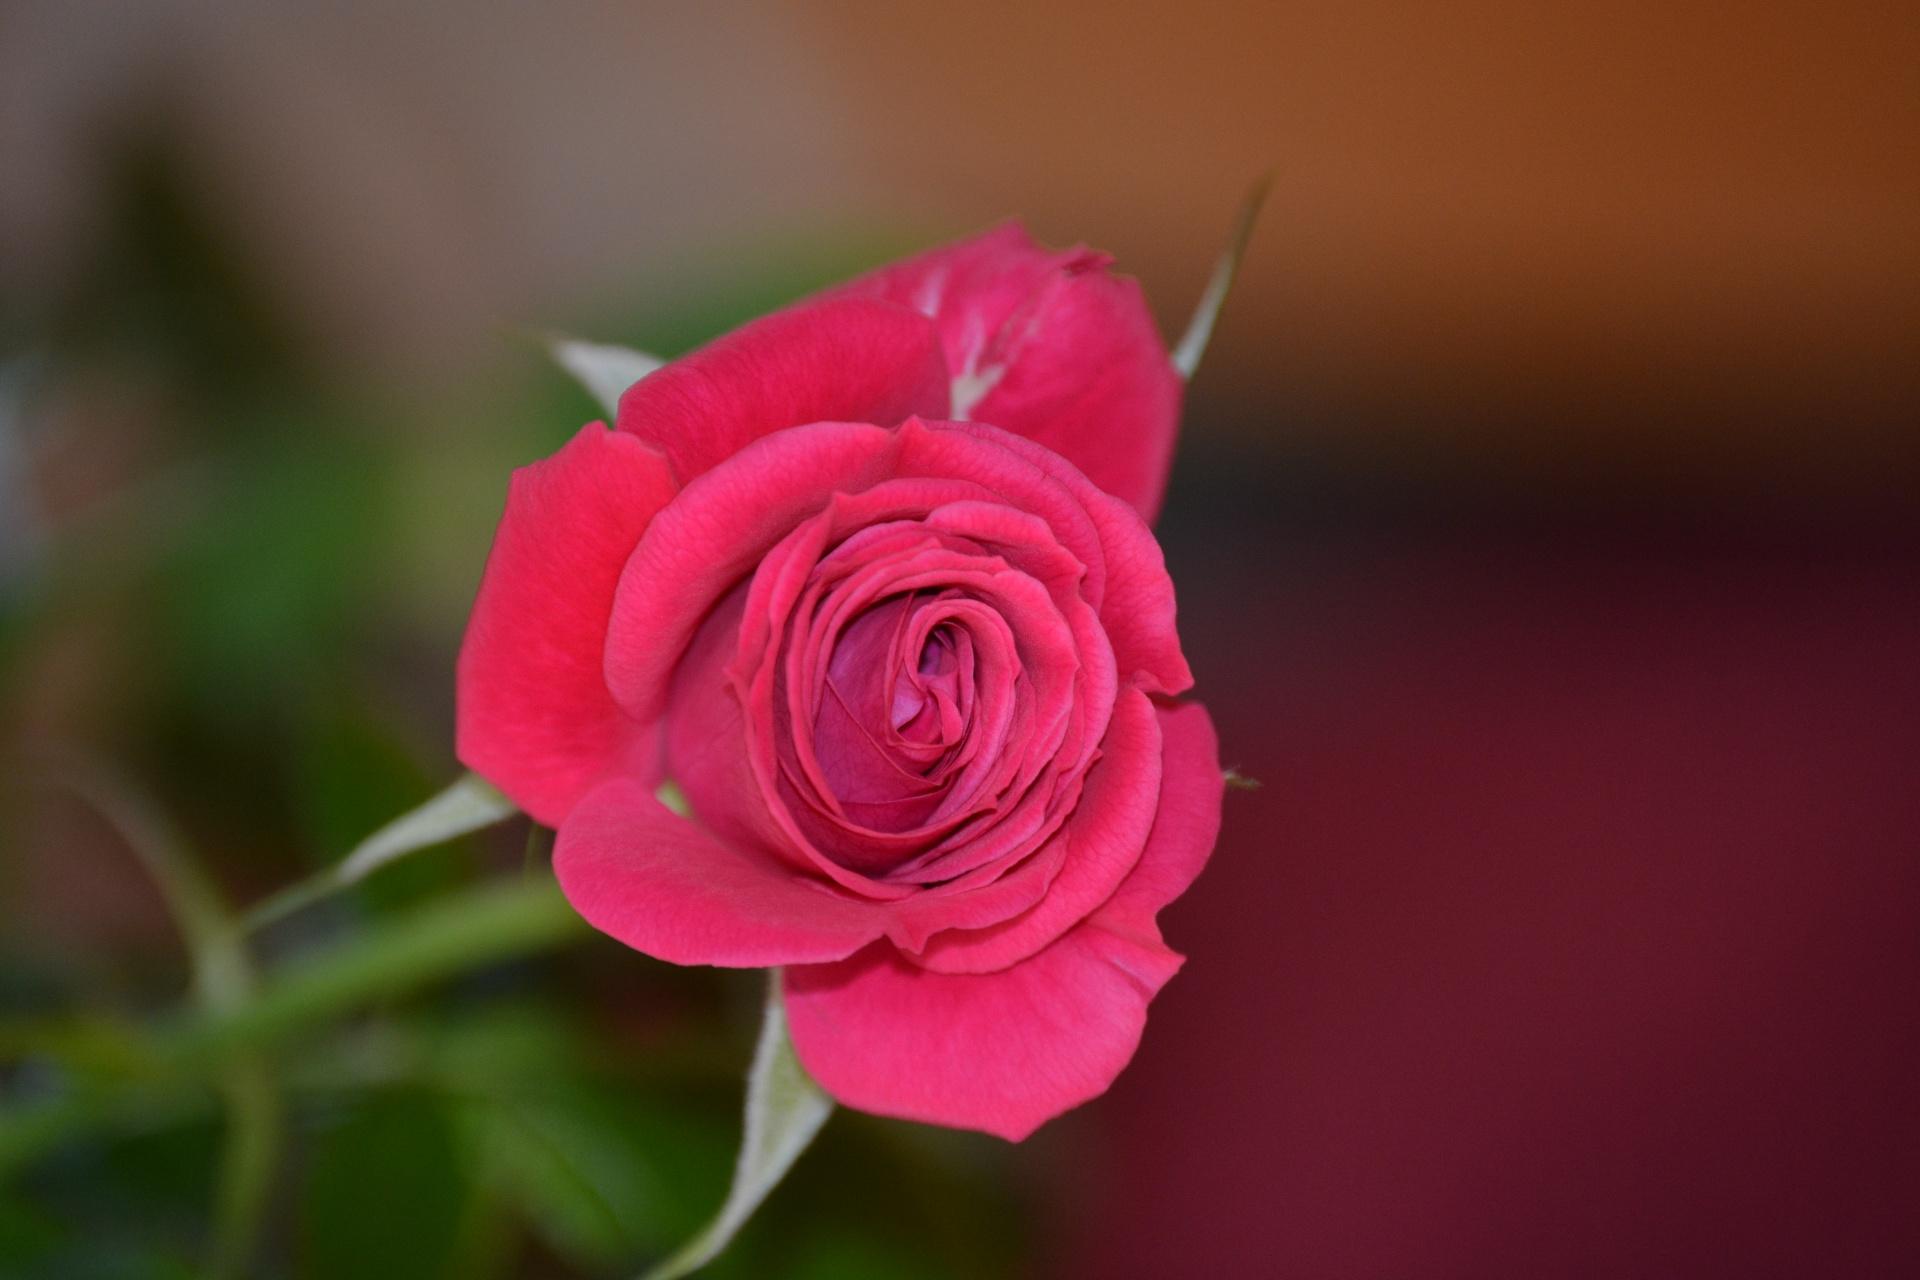 rose,red,pink,single,single rose,flower,flowers,pretty